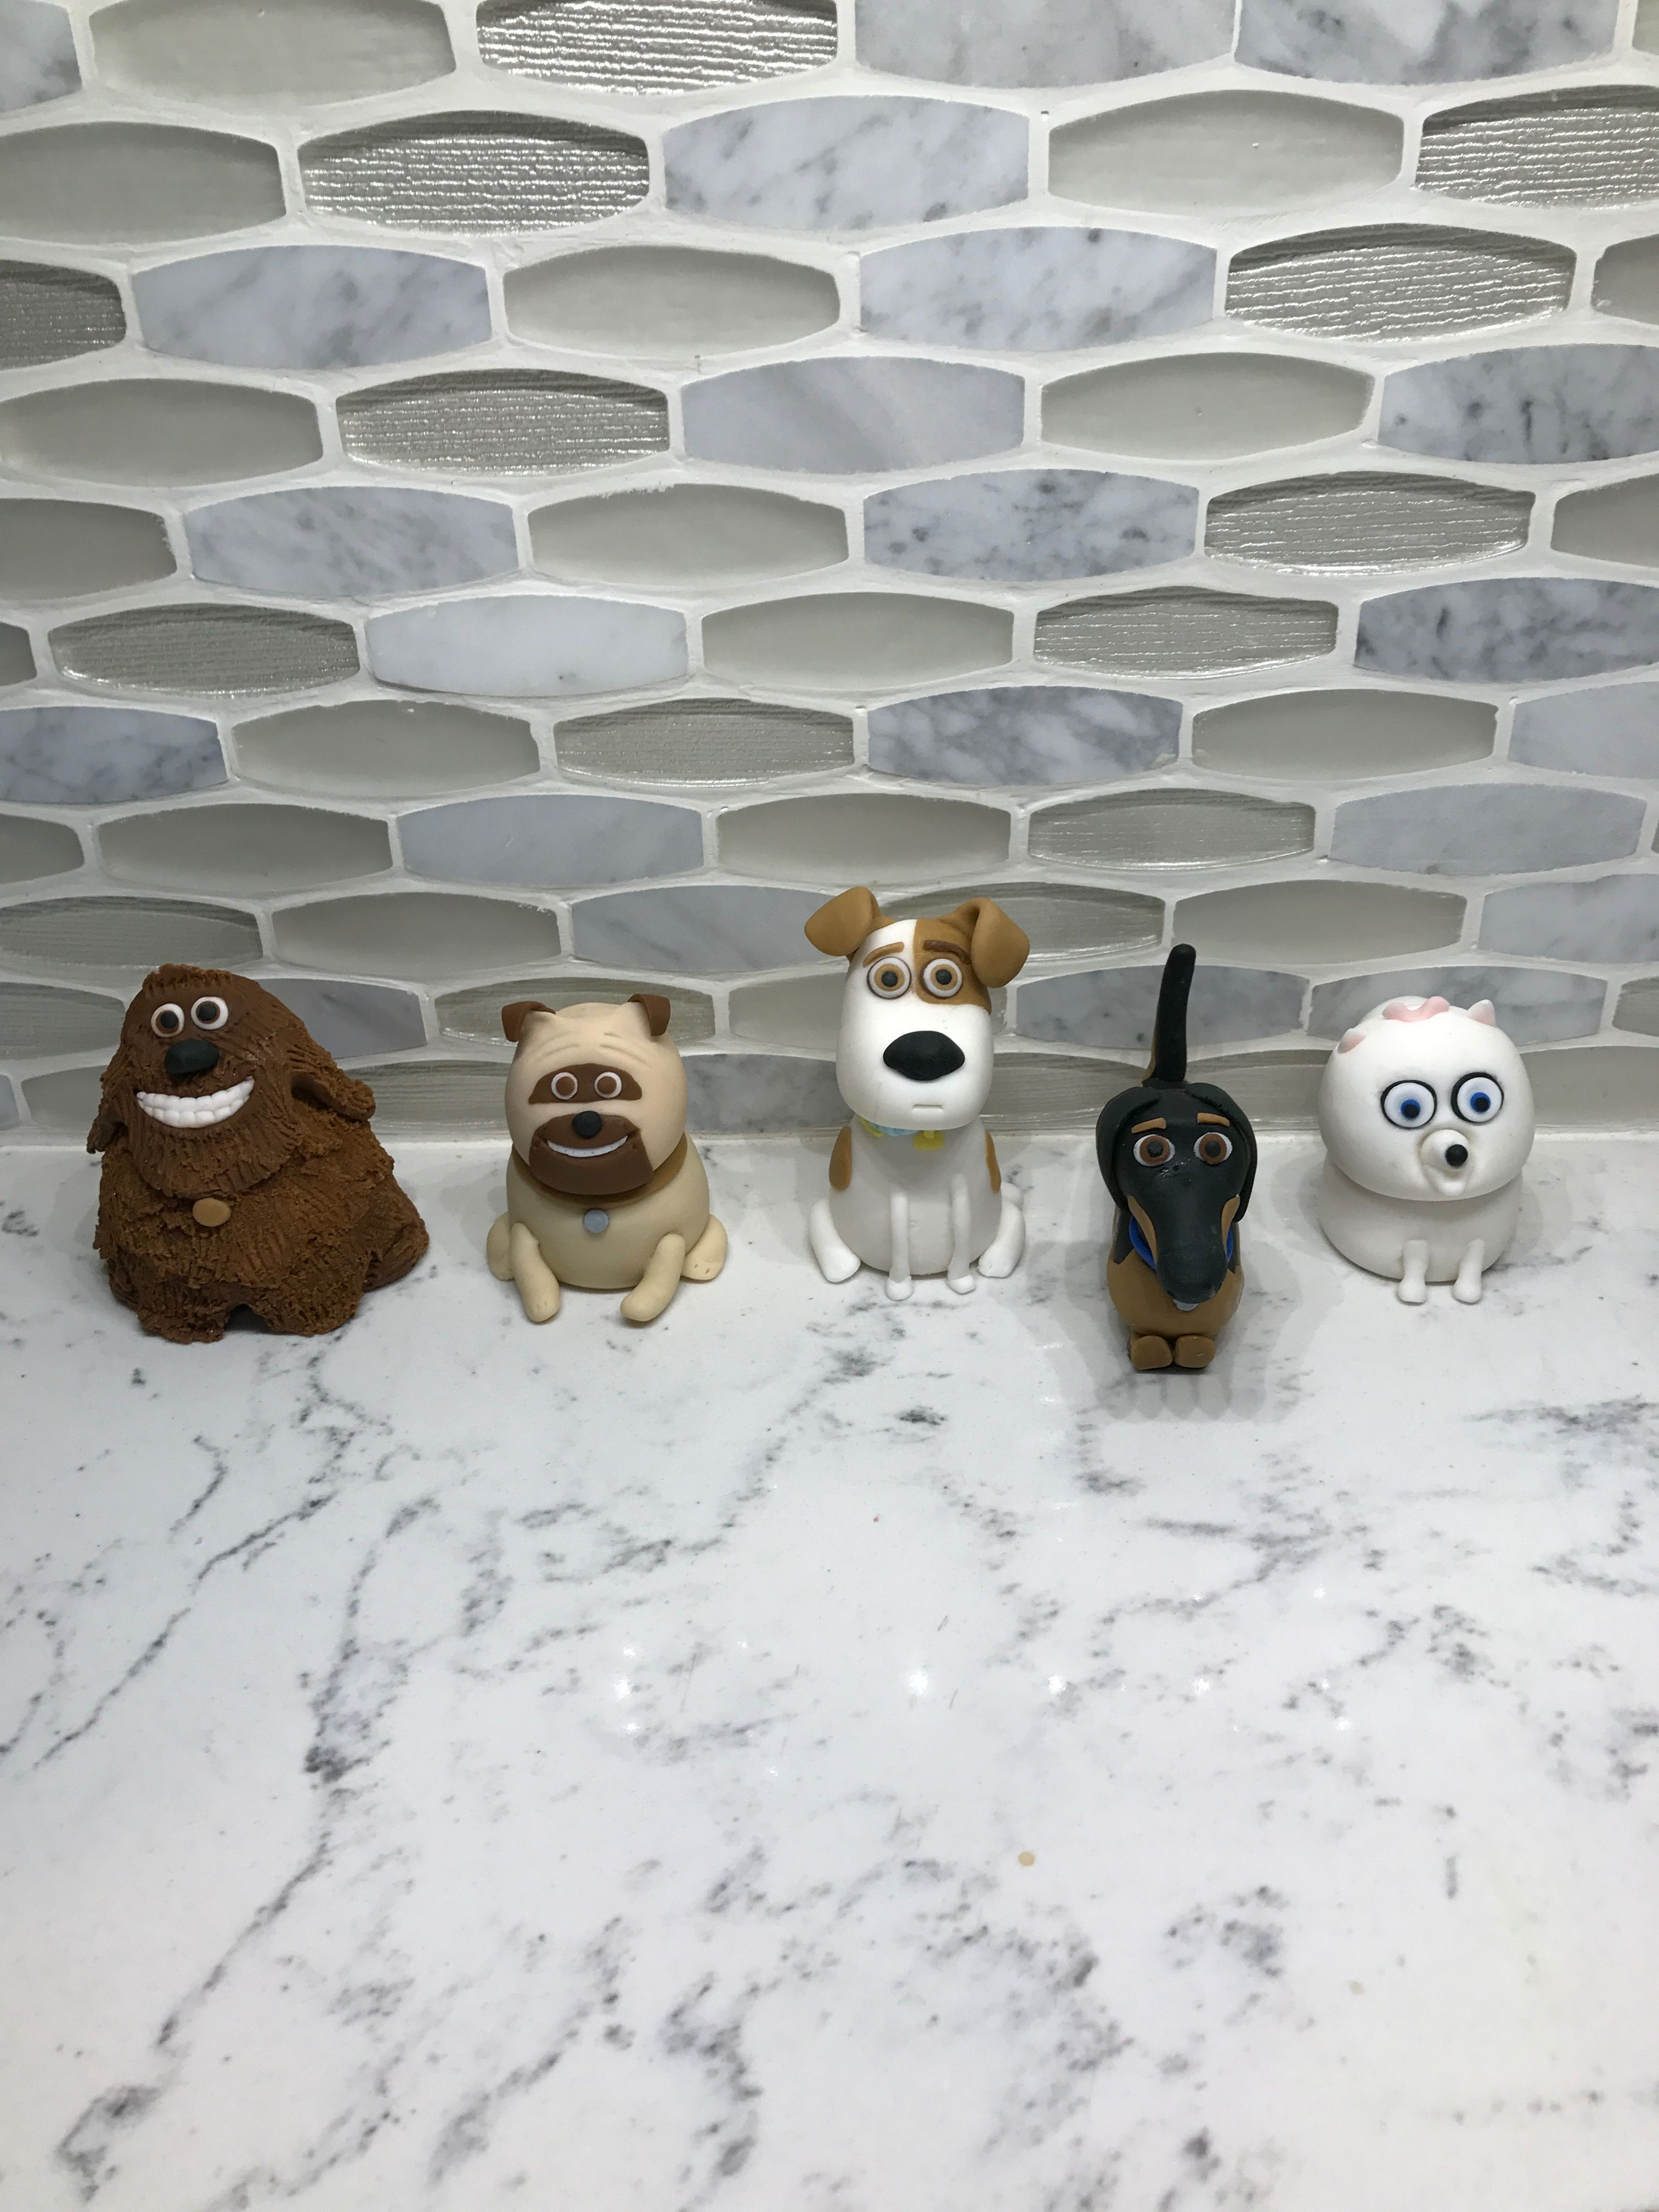 The Secret Life Of Pets Characters In Fondant 차